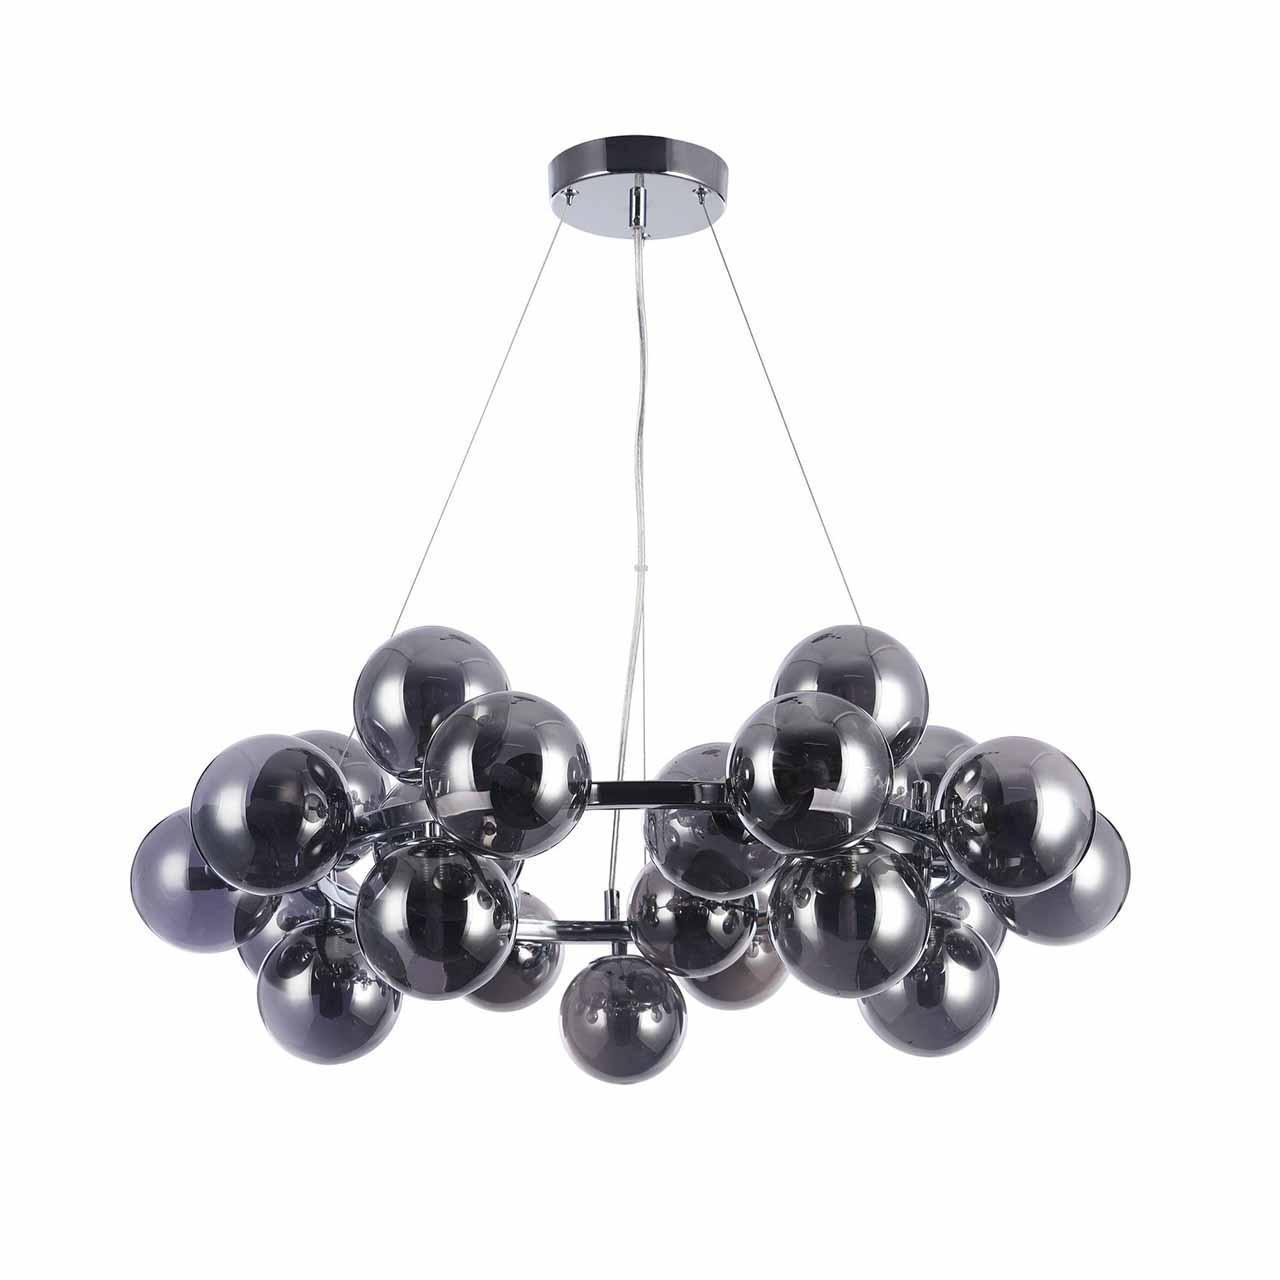 Люстра Maytoni Dallas MOD548PL-25CH подвесная maytoni подвесной светильник maytoni dallas mod548pl 25ch